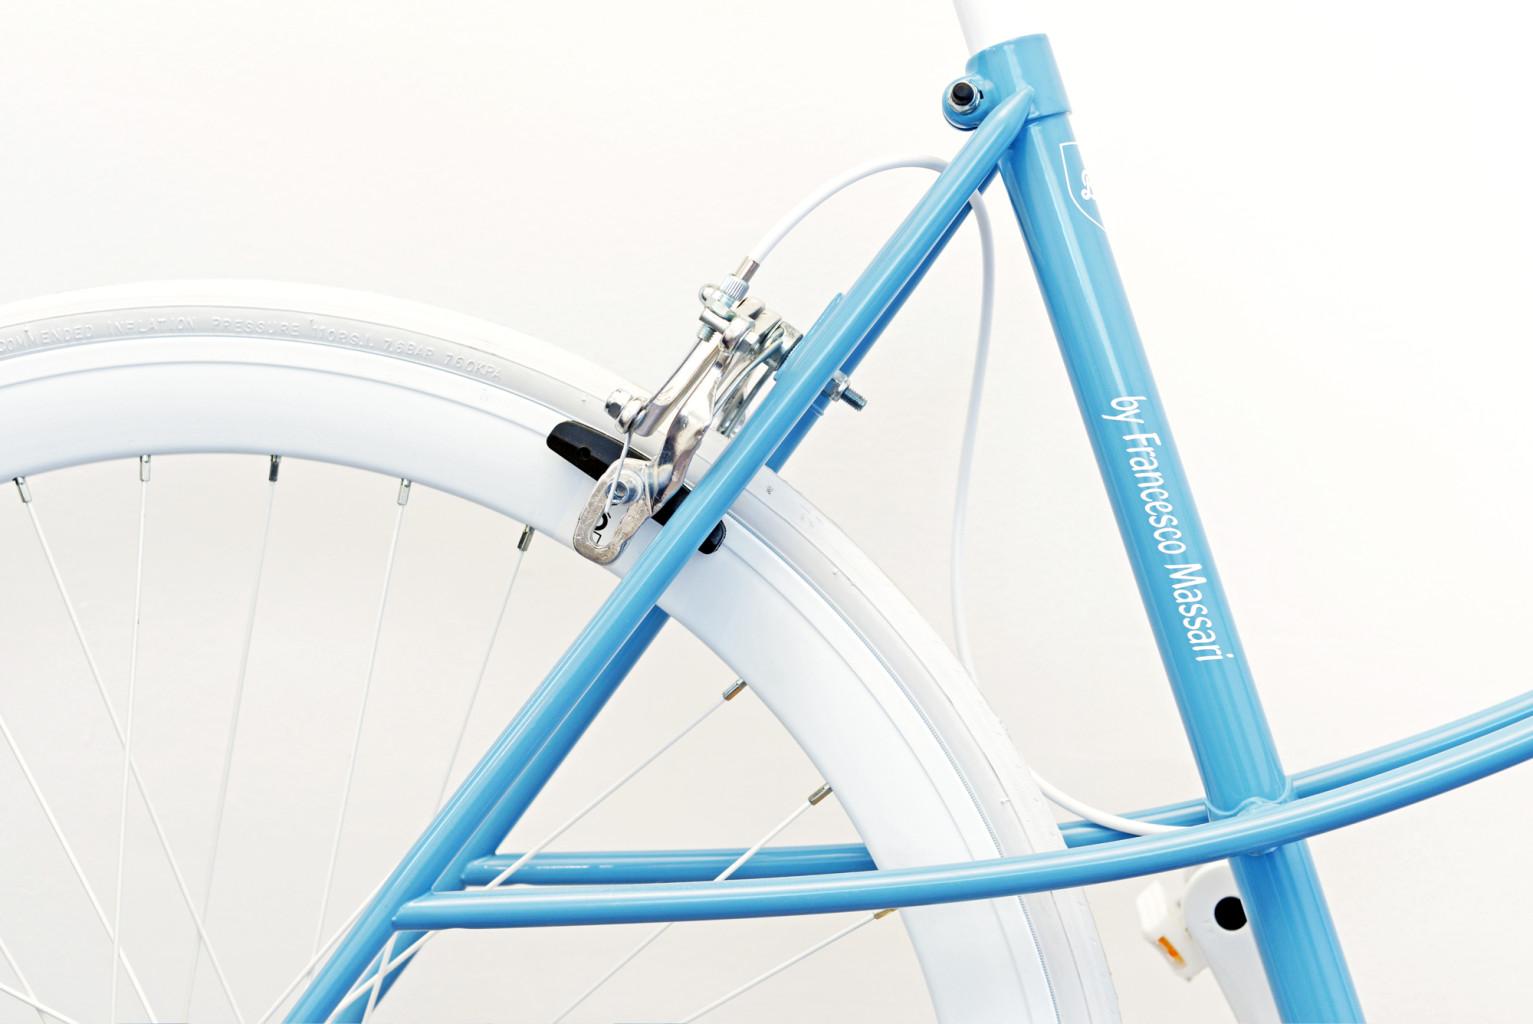 Bespoke bike 16